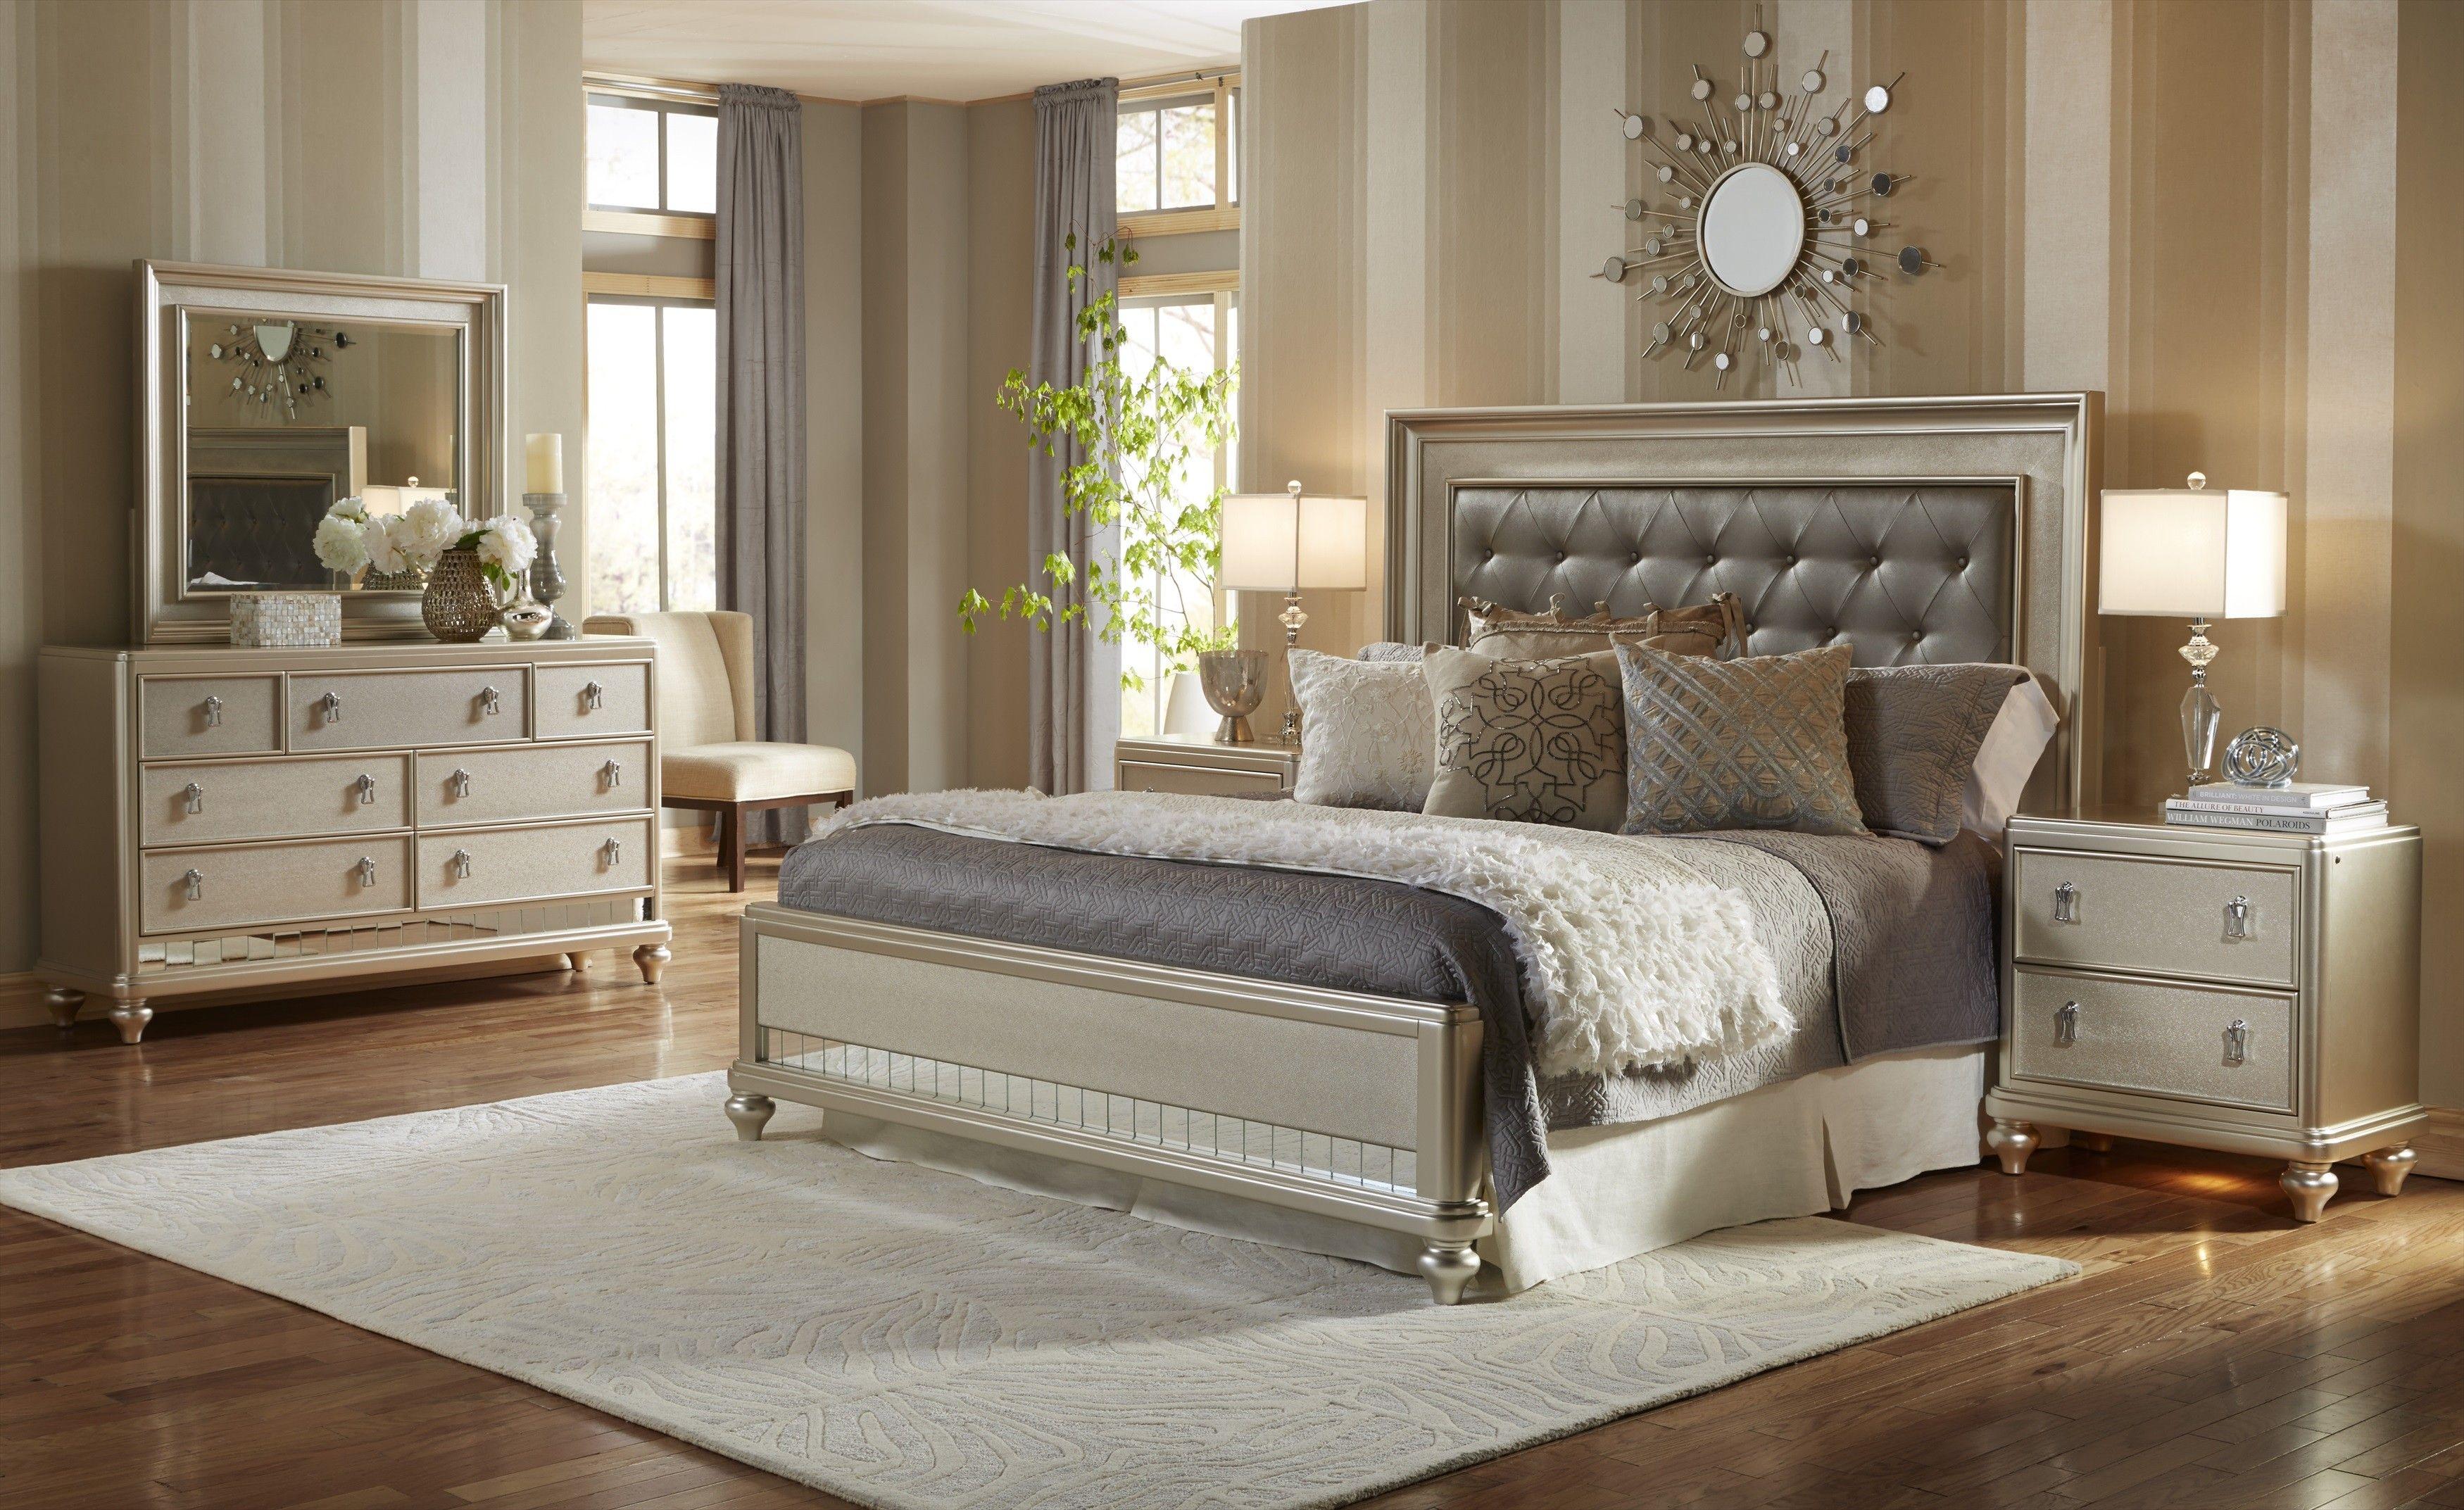 Bedroom Set Design Traditional Champagne Finish Bedroom  Adult  Bedroom  Ideas For